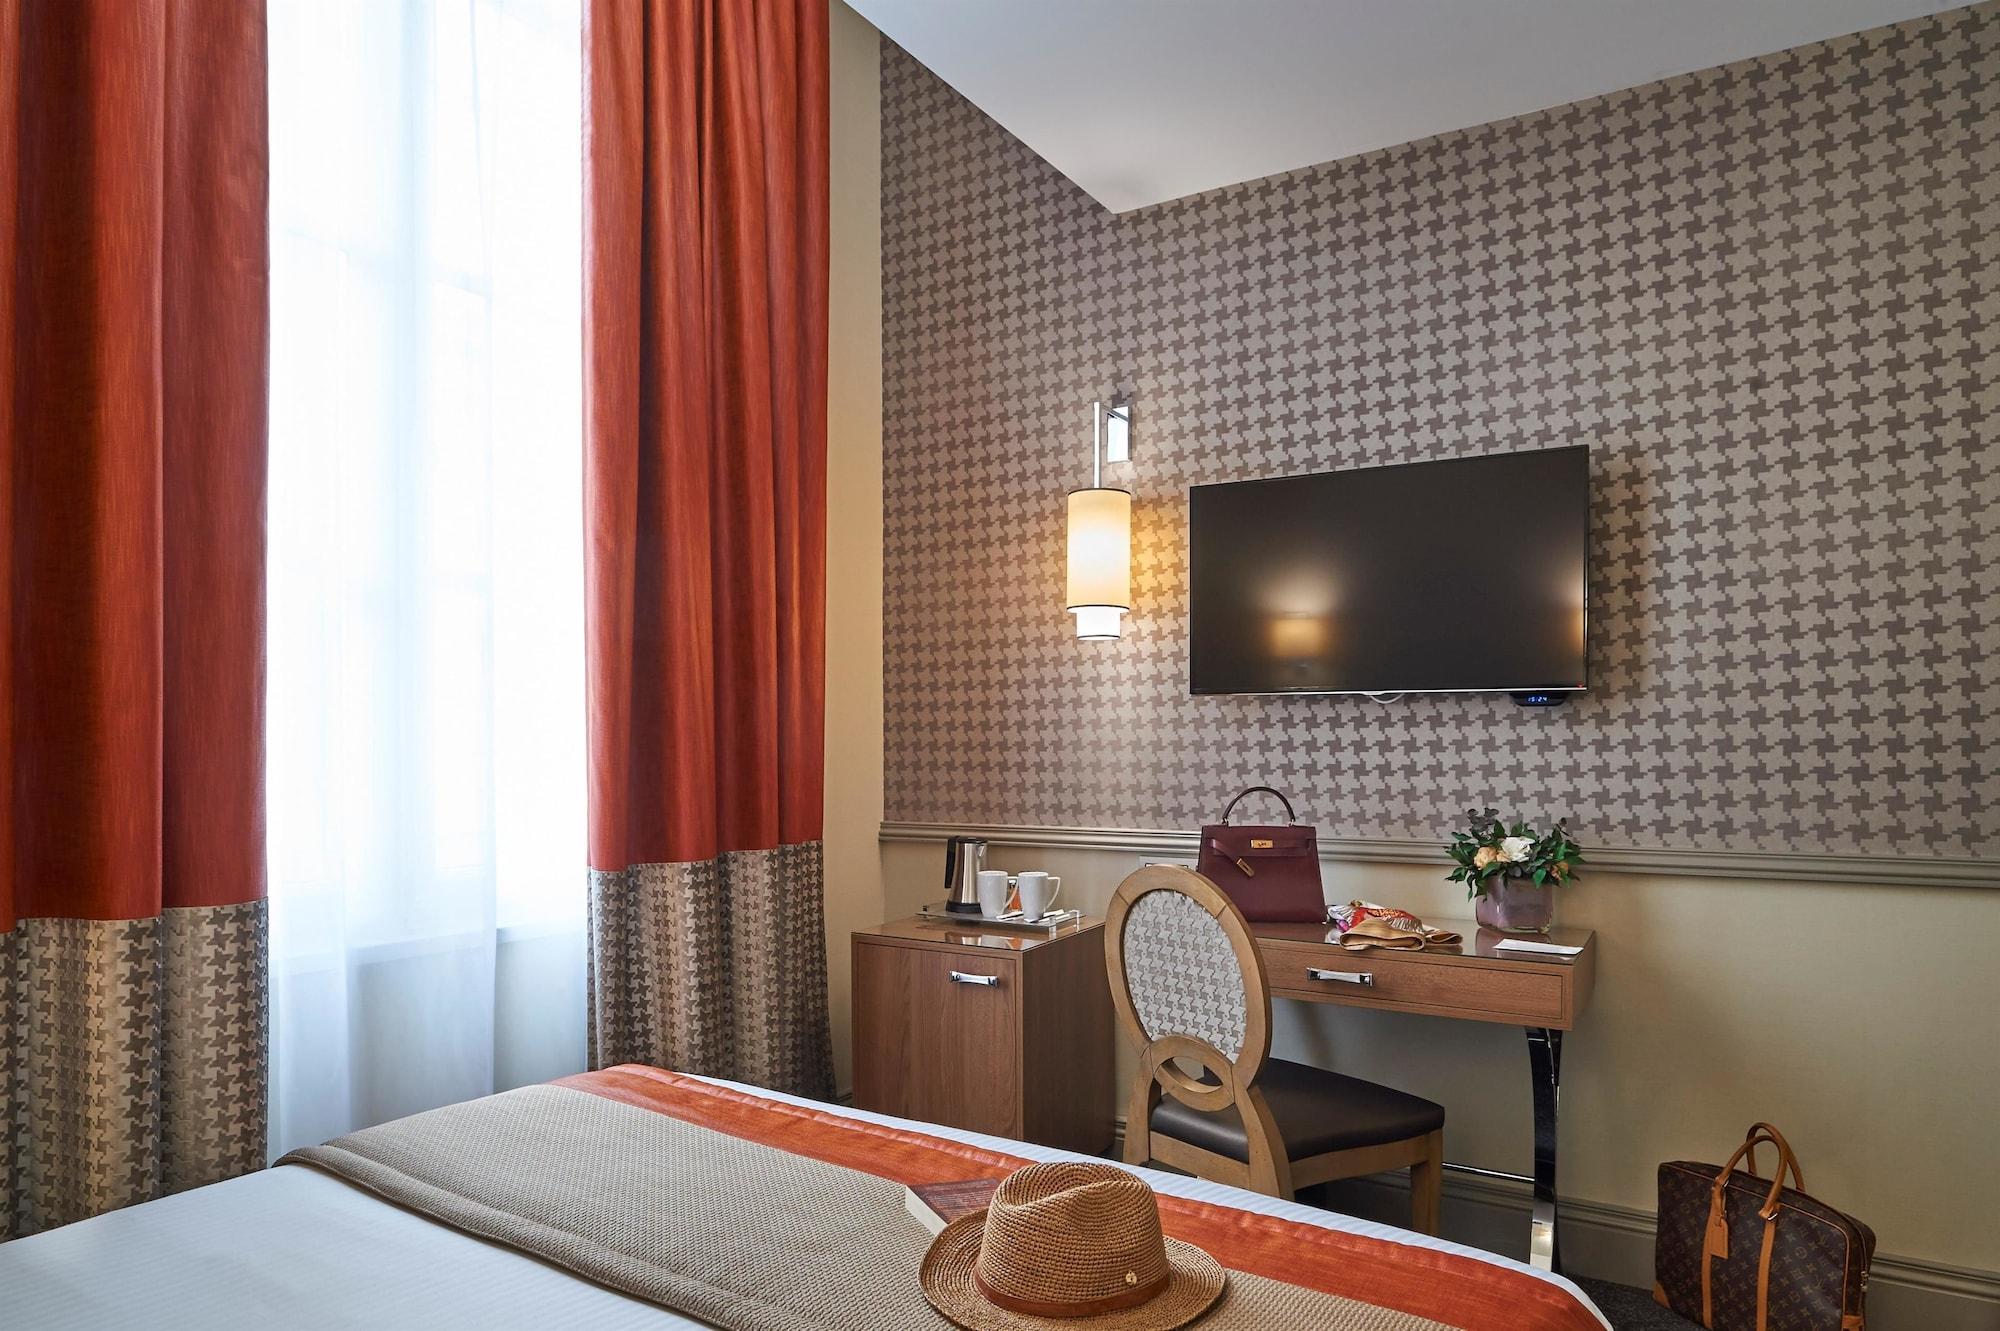 Best Western Premier Hotel Bayonne Etche Ona - Bordeaux, Gironde